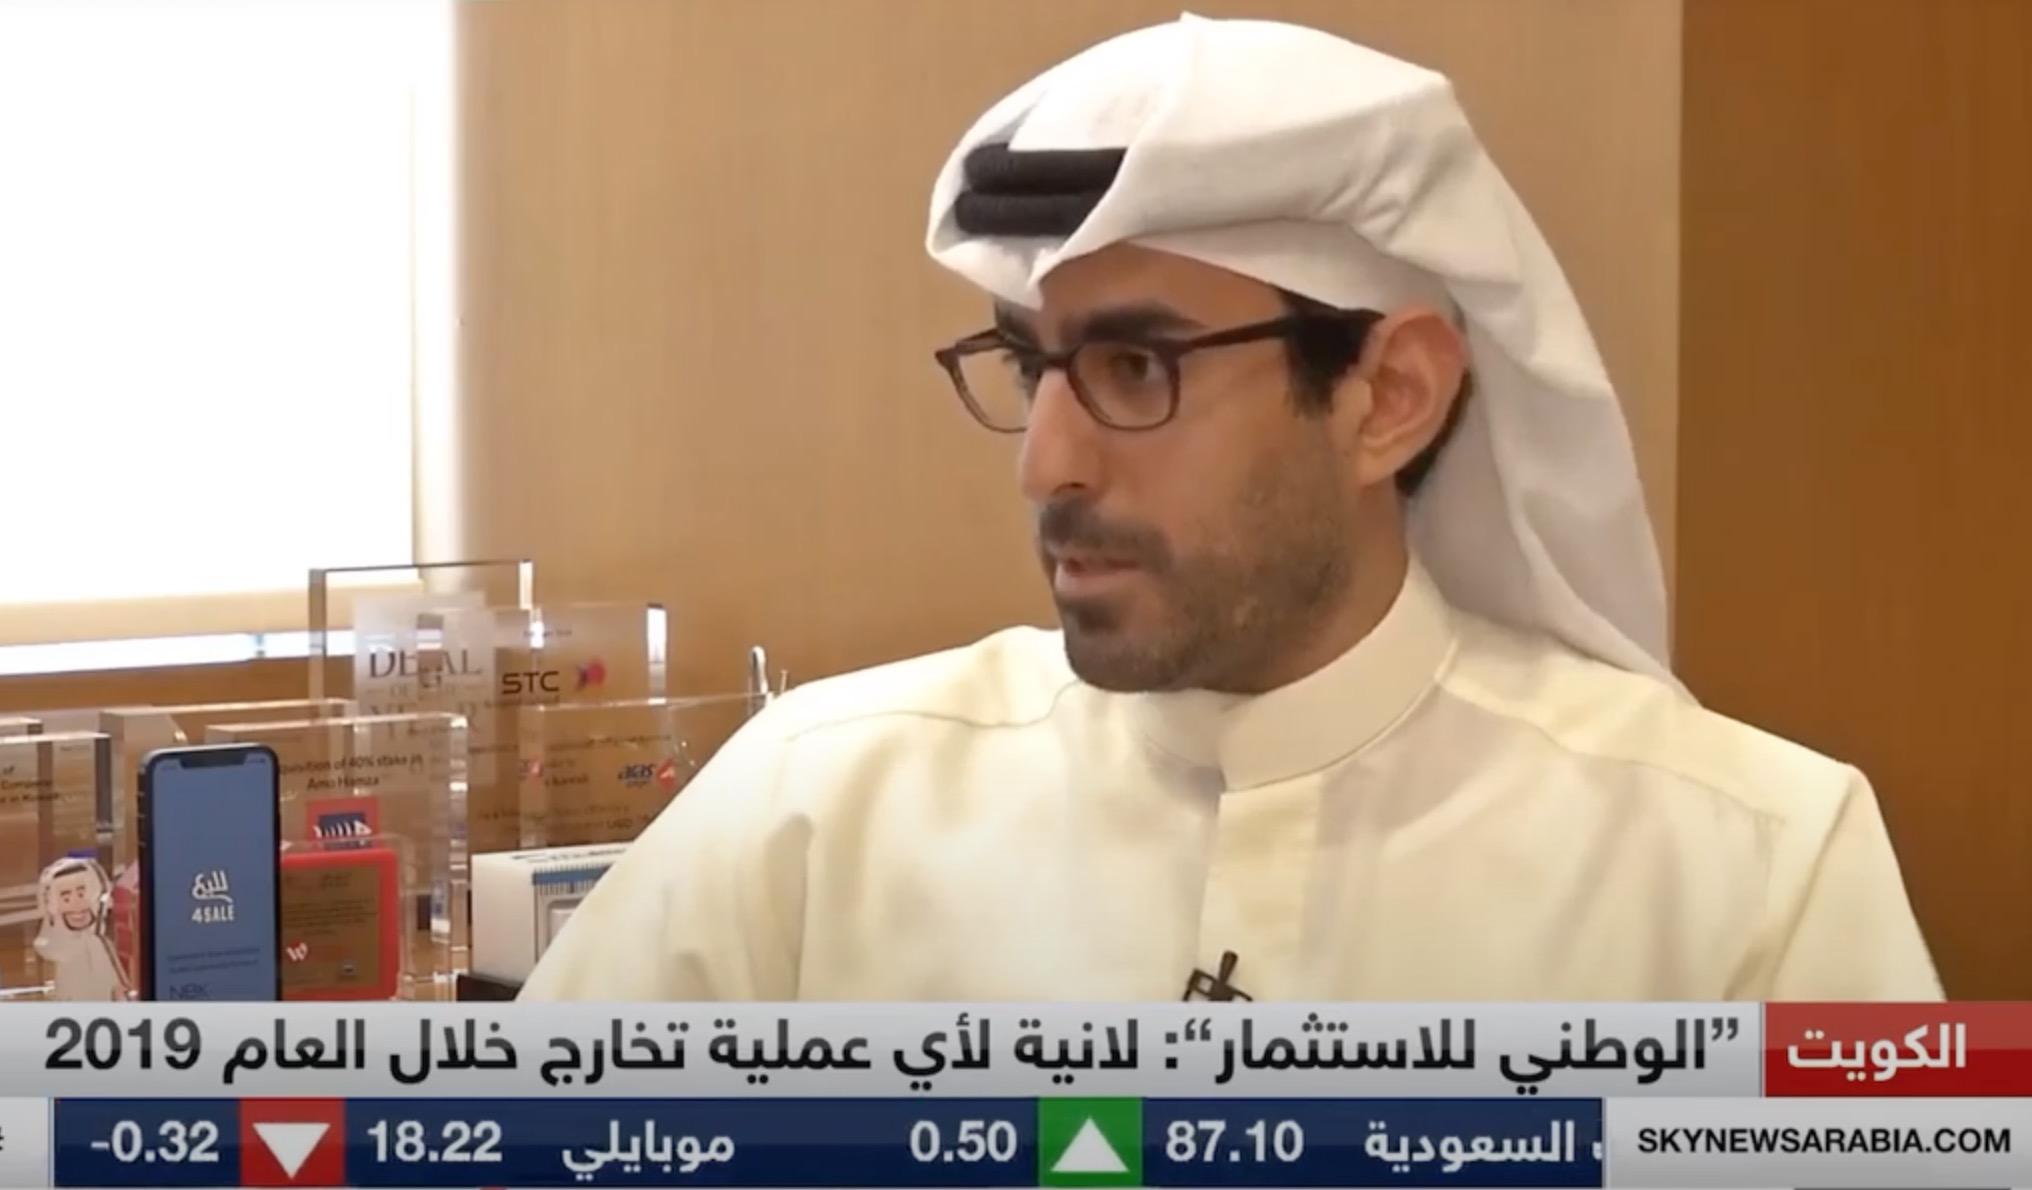 Interview with the CEO of a NBK Capital company  Faisal Abdullatif Al- Hamad on Sky News – Arabia